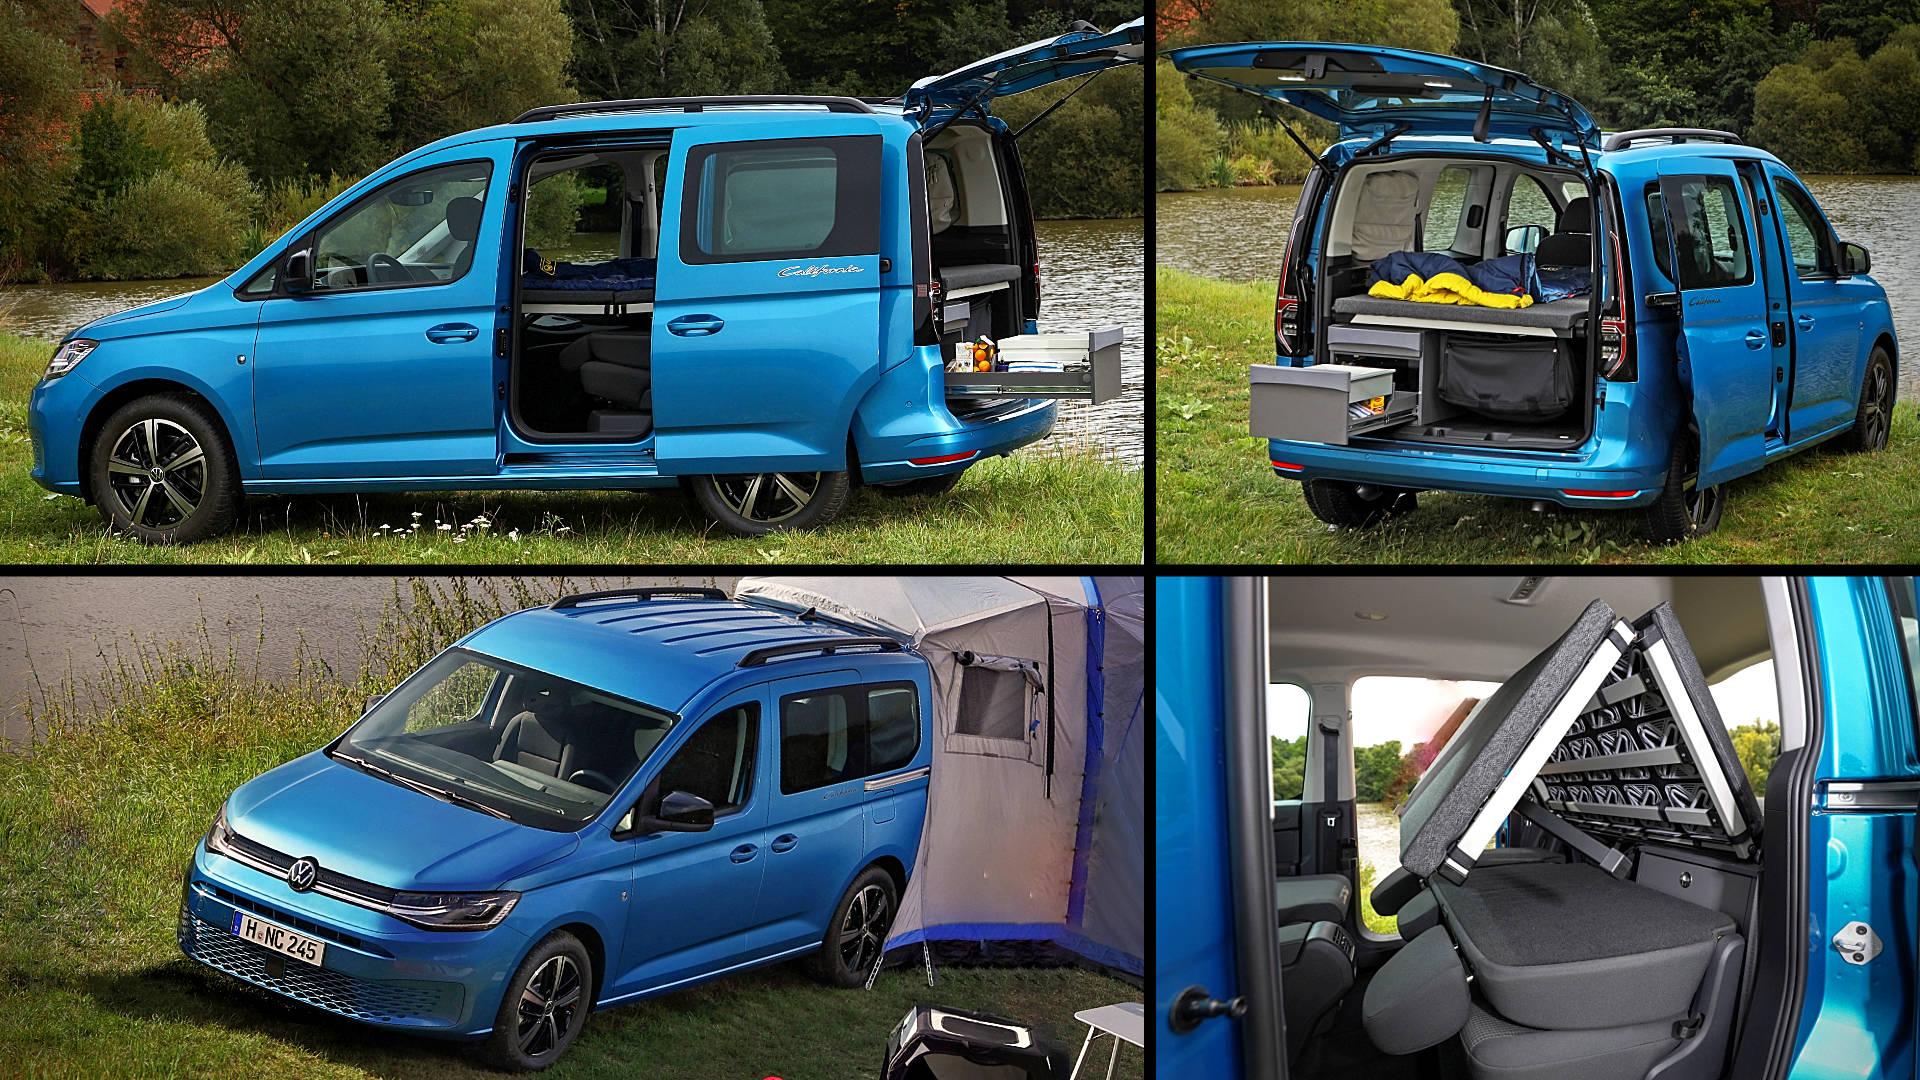 2021 Vw Caddy California Blue Van